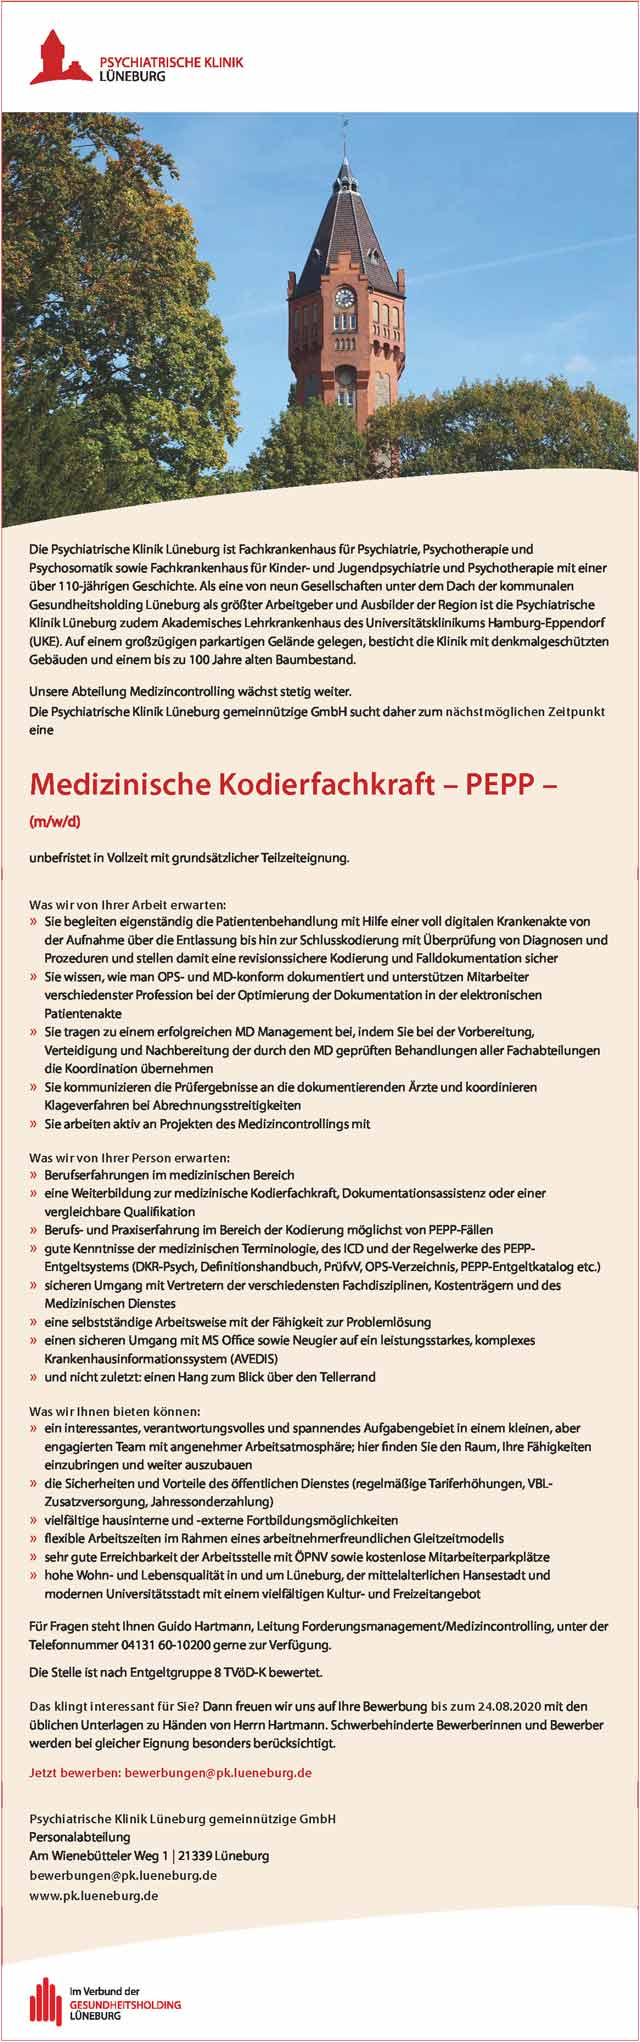 Psychiatrische Klinik Lüneburg: Medizinische Kodierfachkraft PEPP (m/w/d)